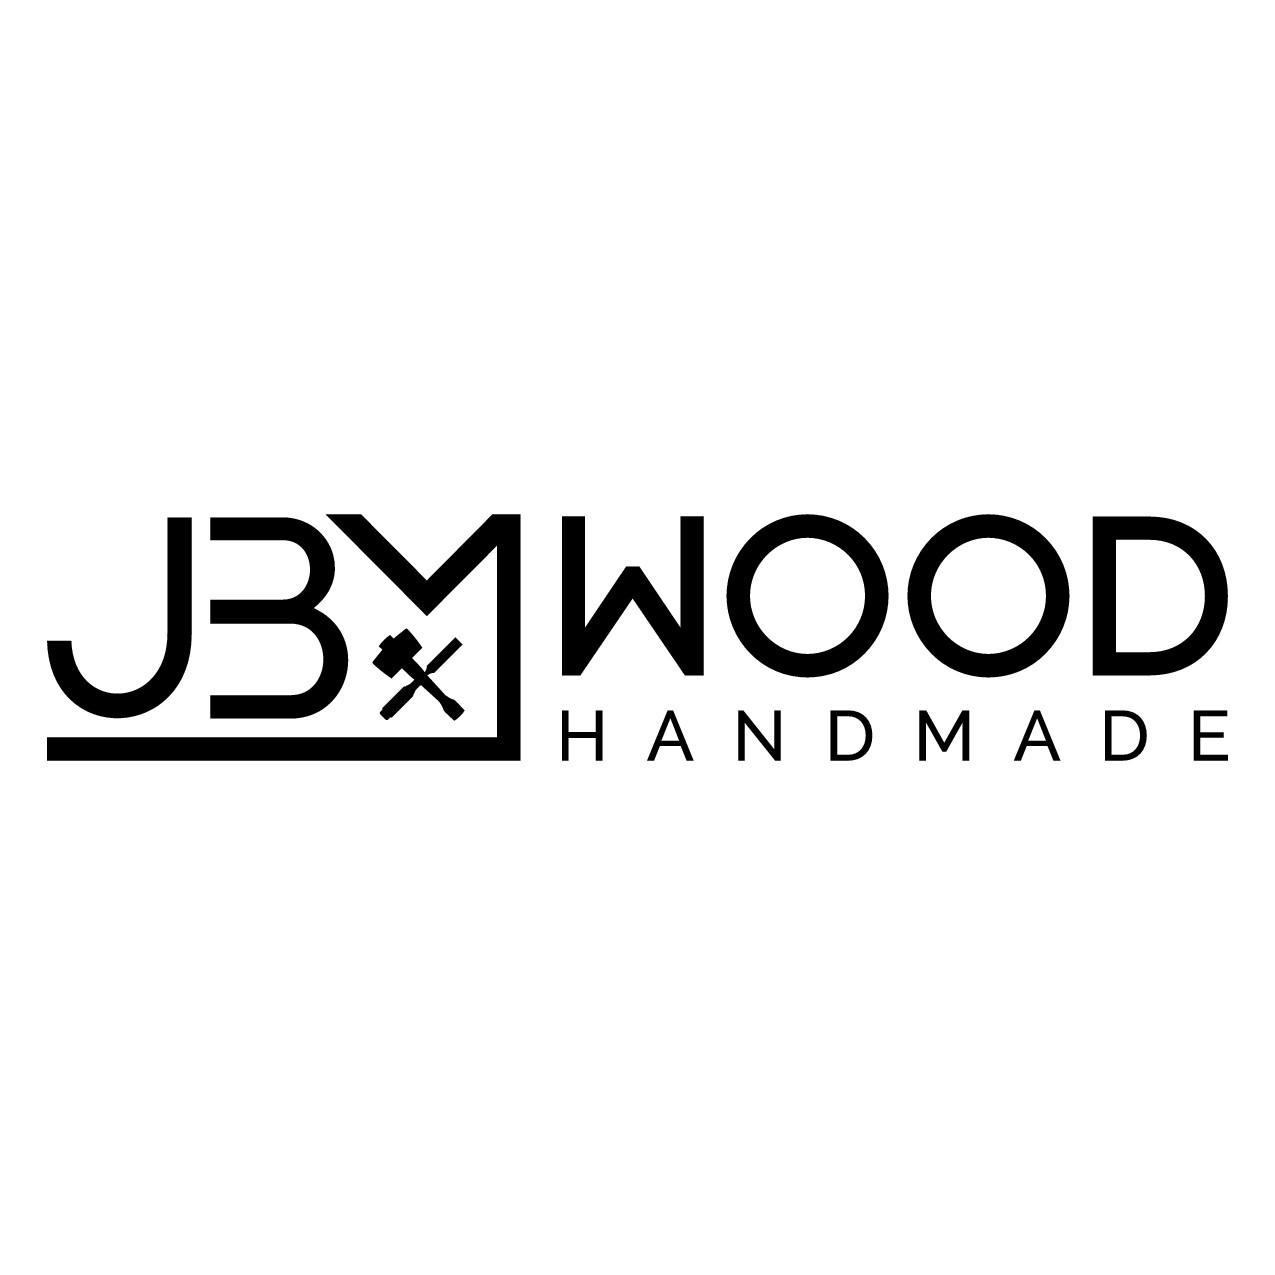 JBM Wood - Hand Made